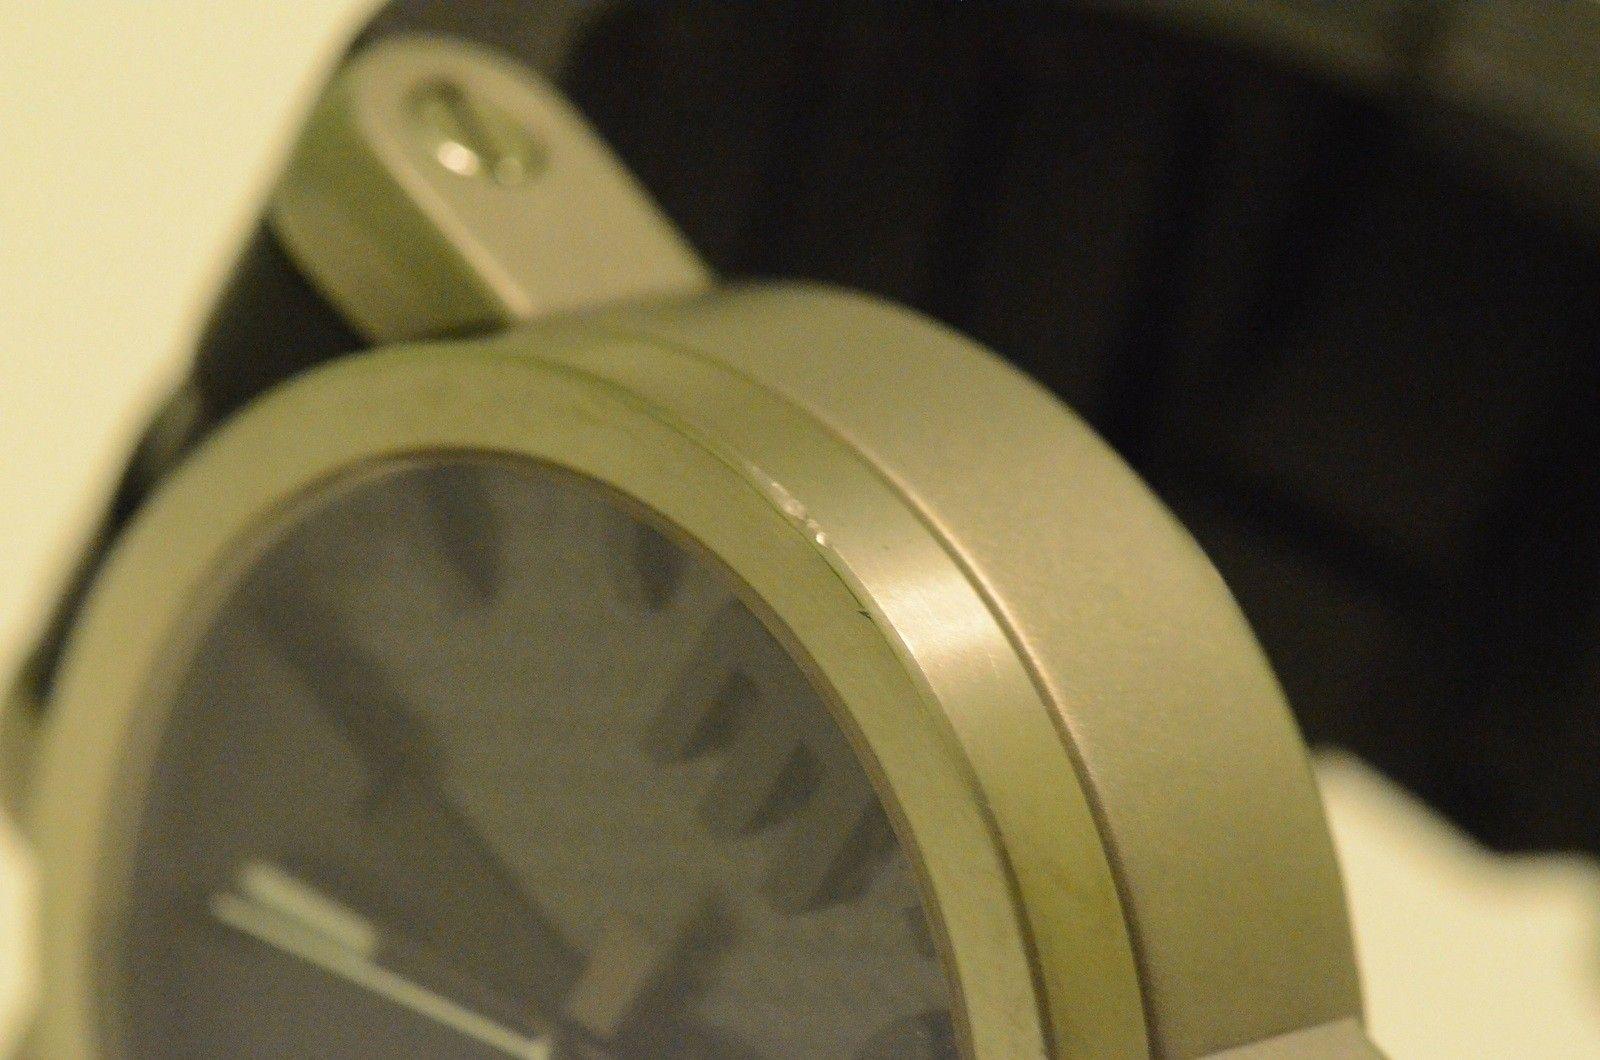 Gearbox Brushed Titanium- Carbon Fiber Dial SOLD! - DSC_0451.JPG